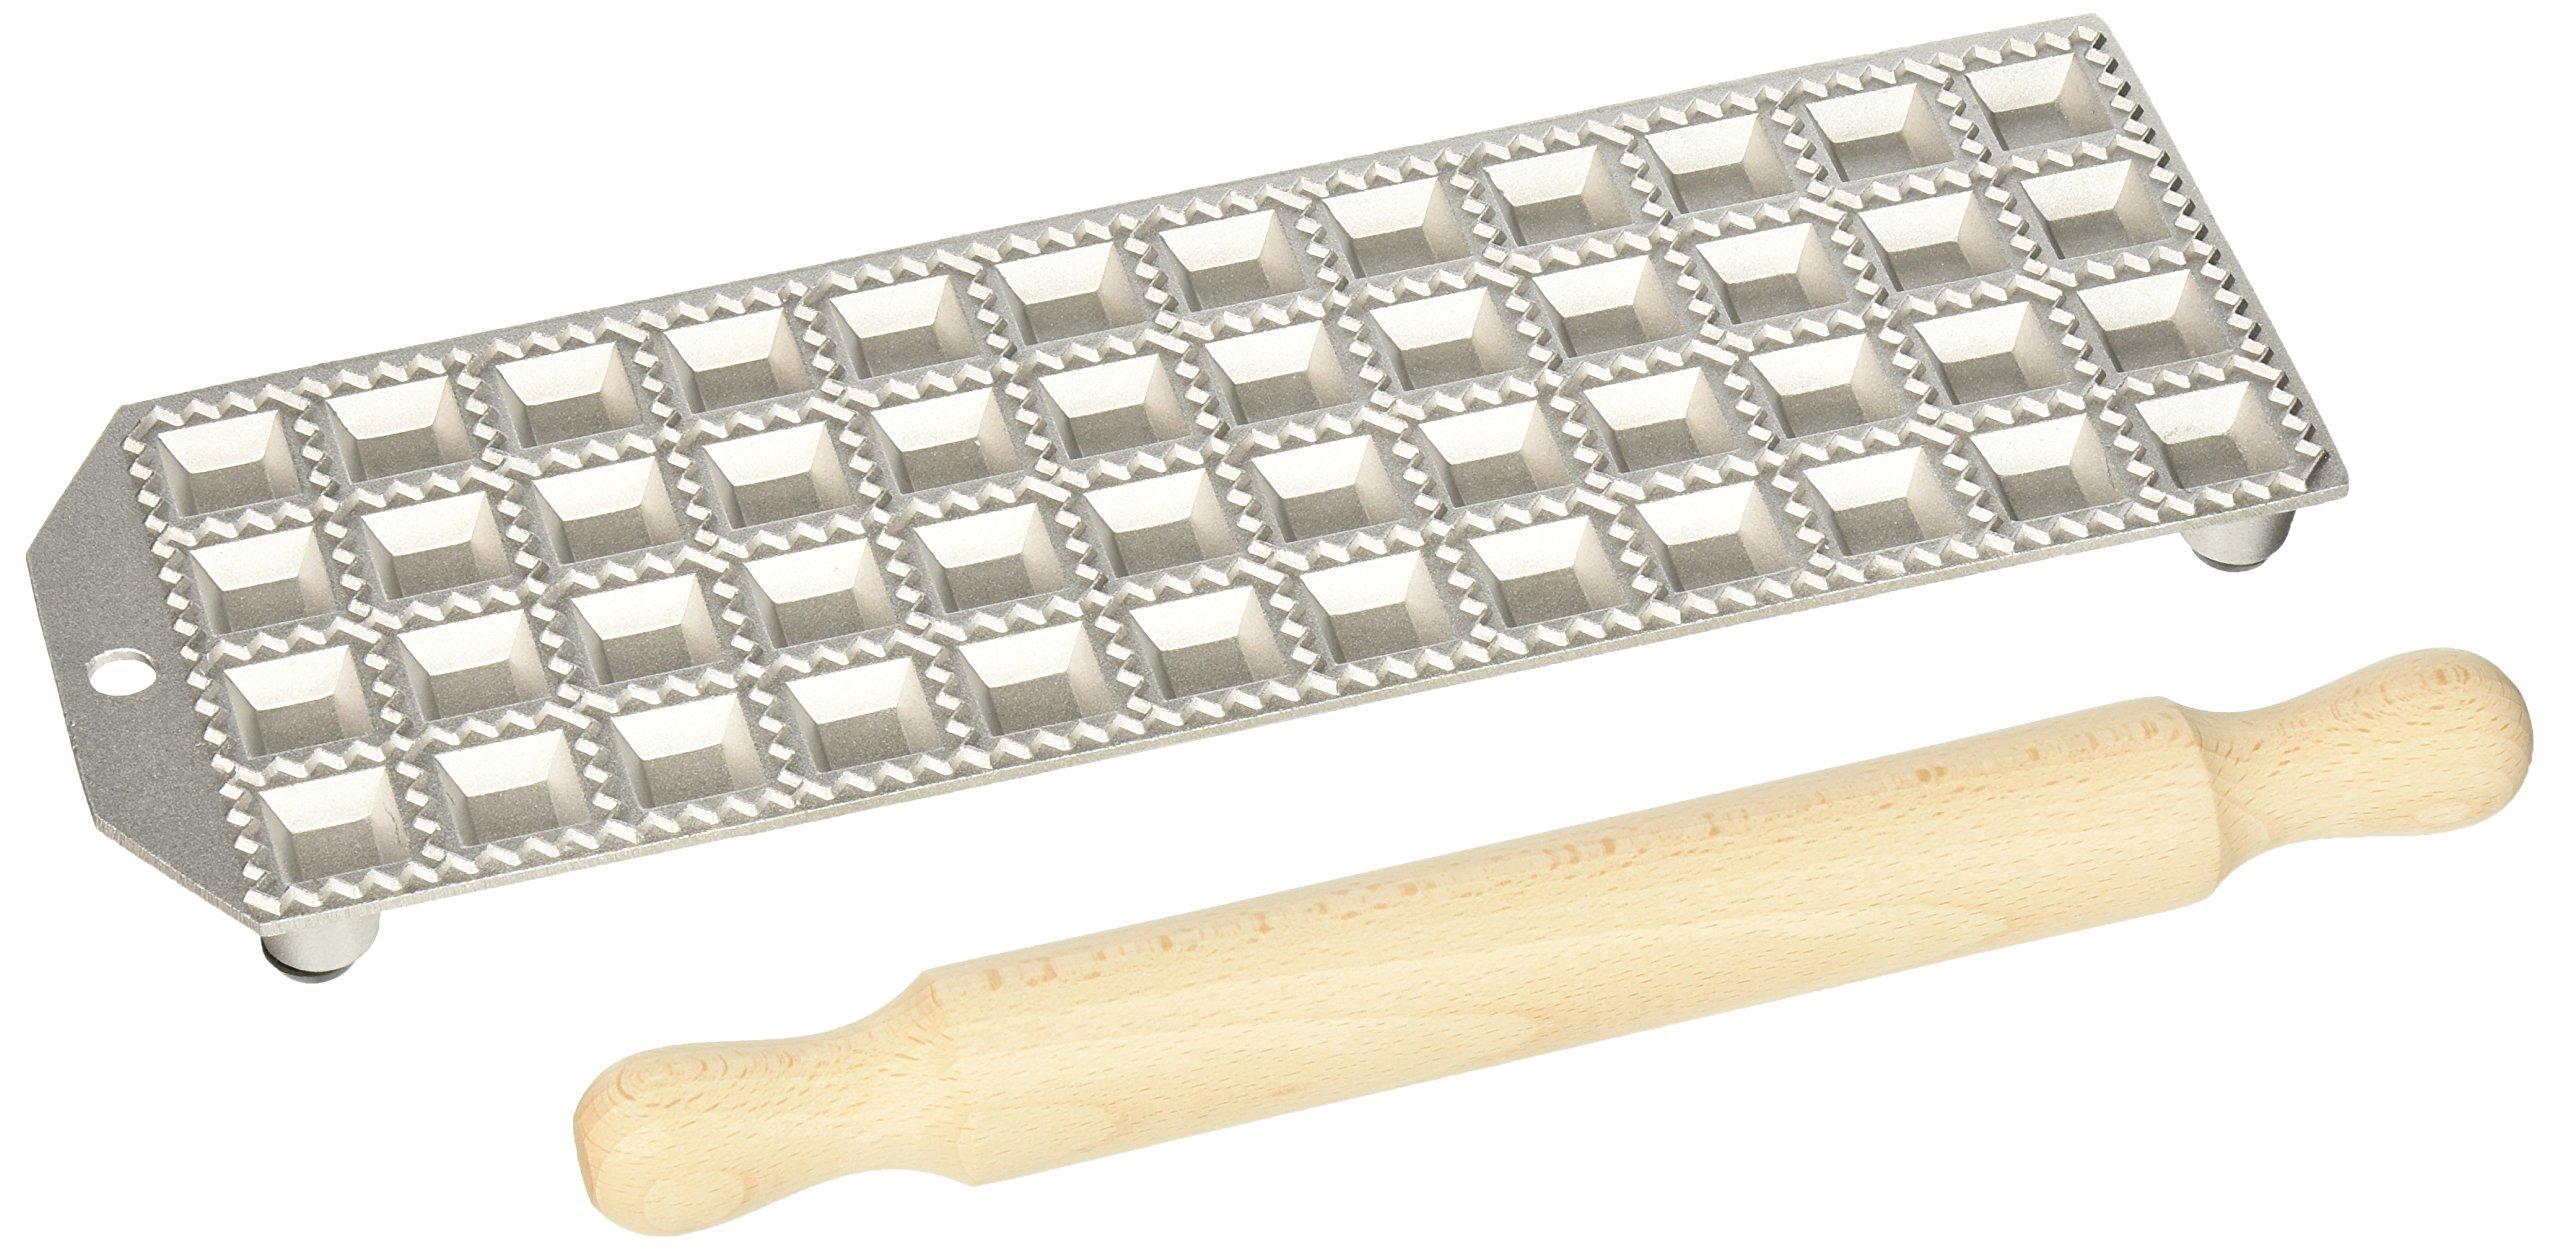 Eppicotispai 48 Holes Aluminum Square Ravioli Maker with Rolling Pin